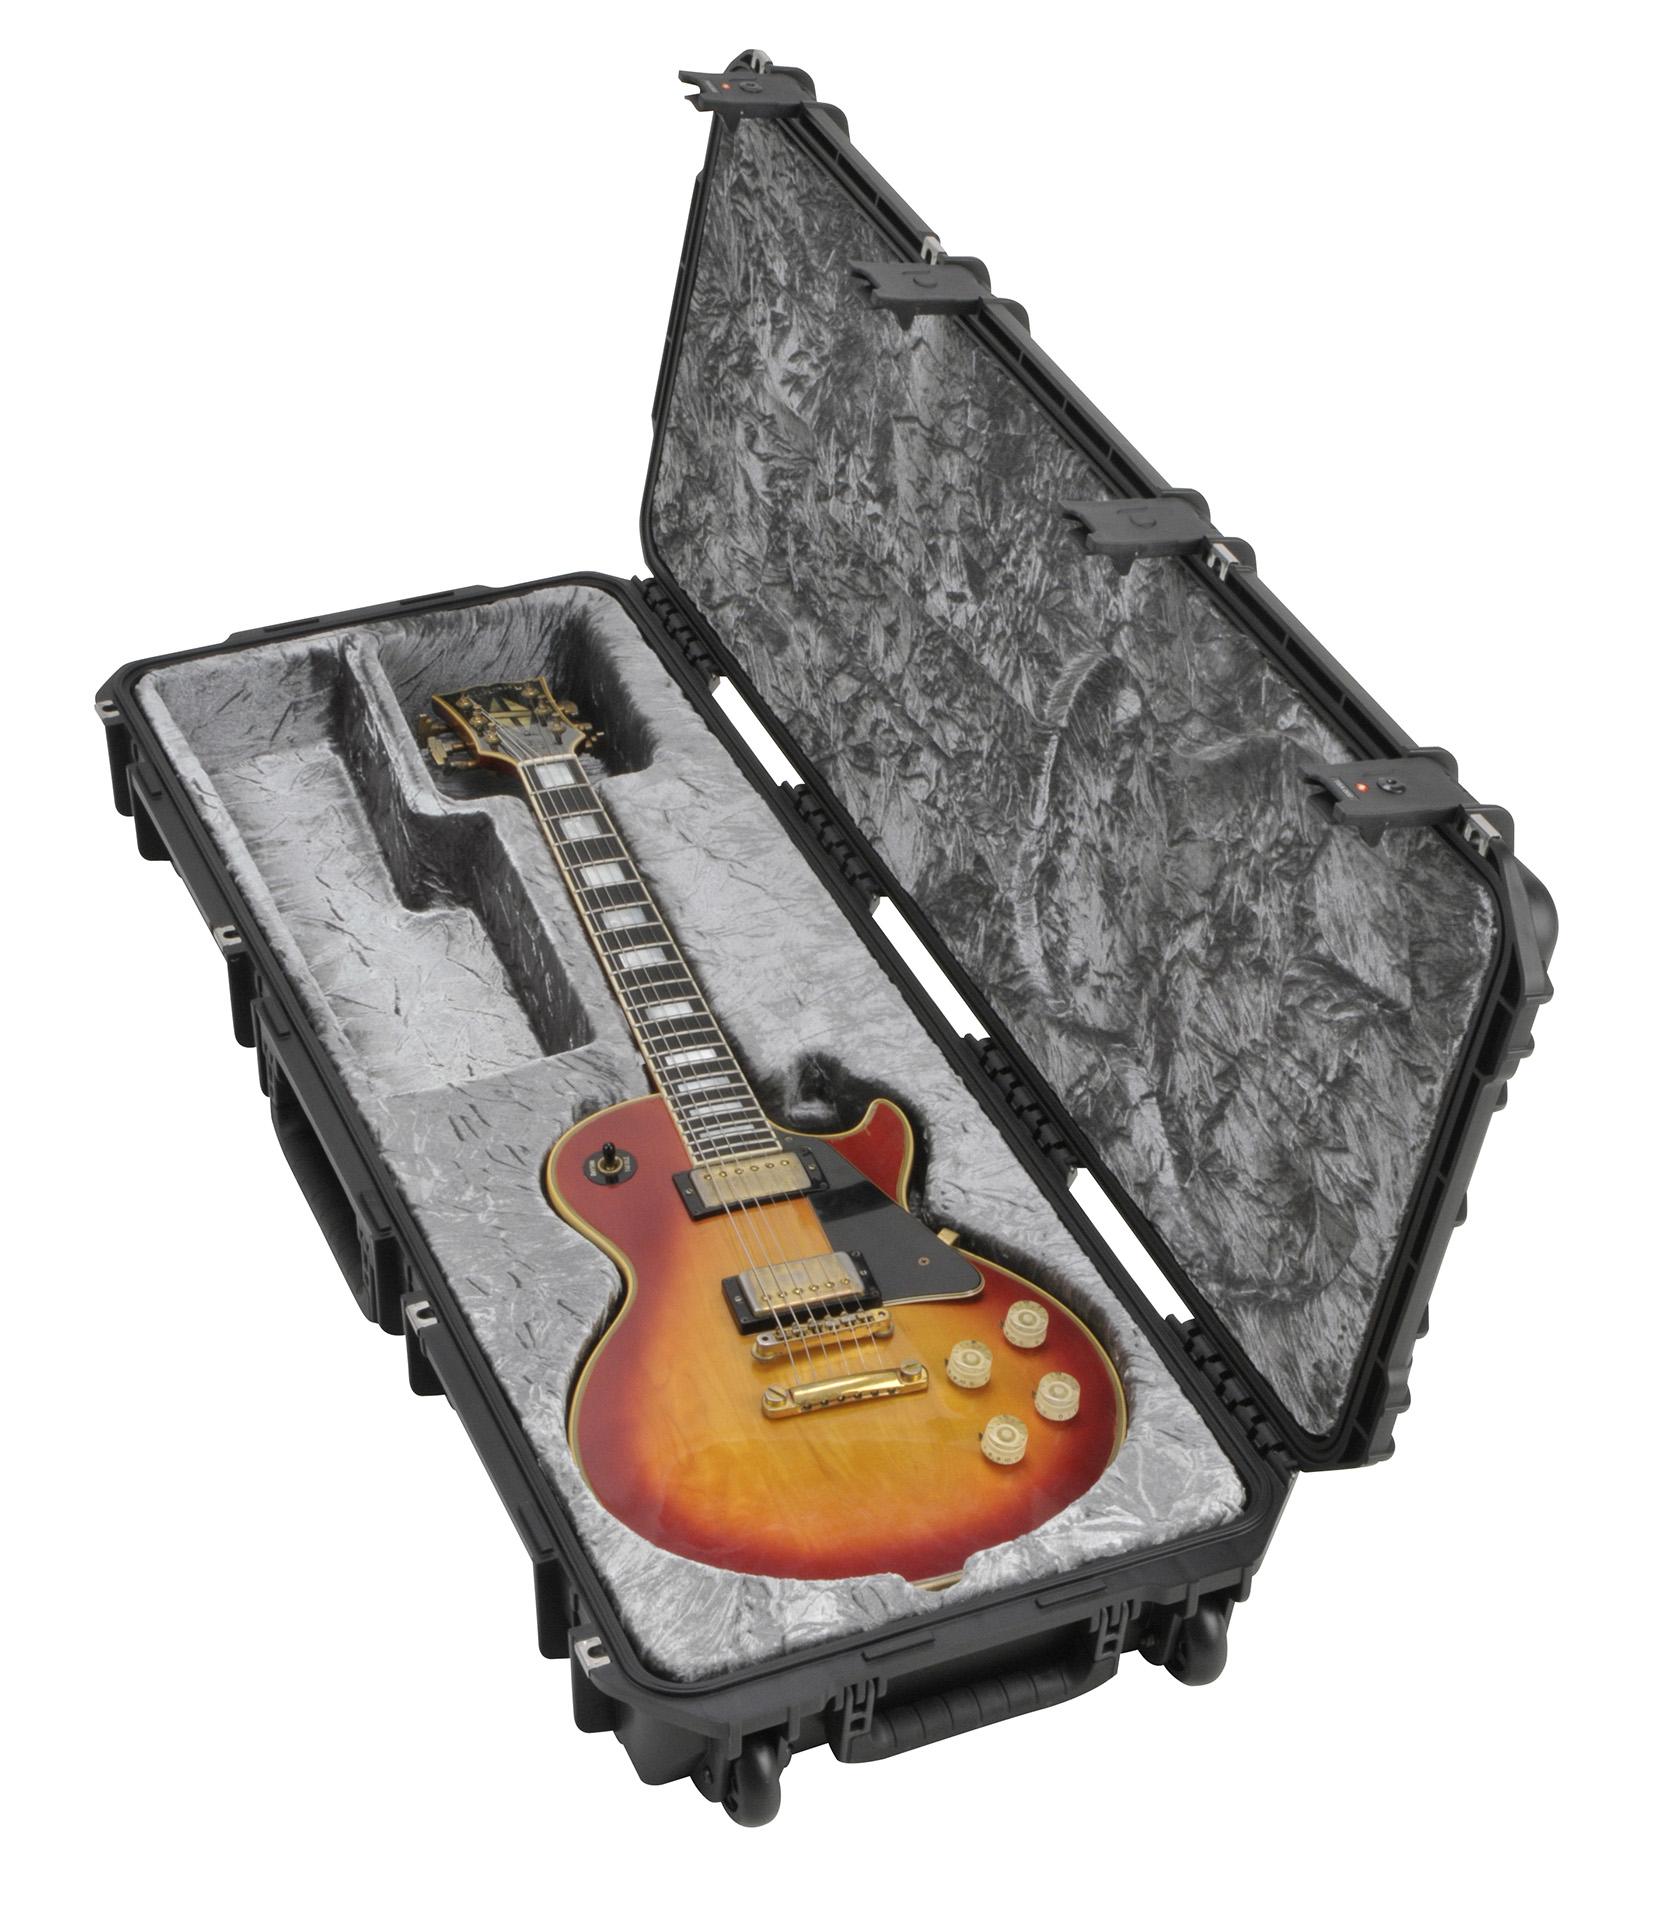 skb - 3i 4214 56 Injection molded Les Paul Flight Case - Melody House